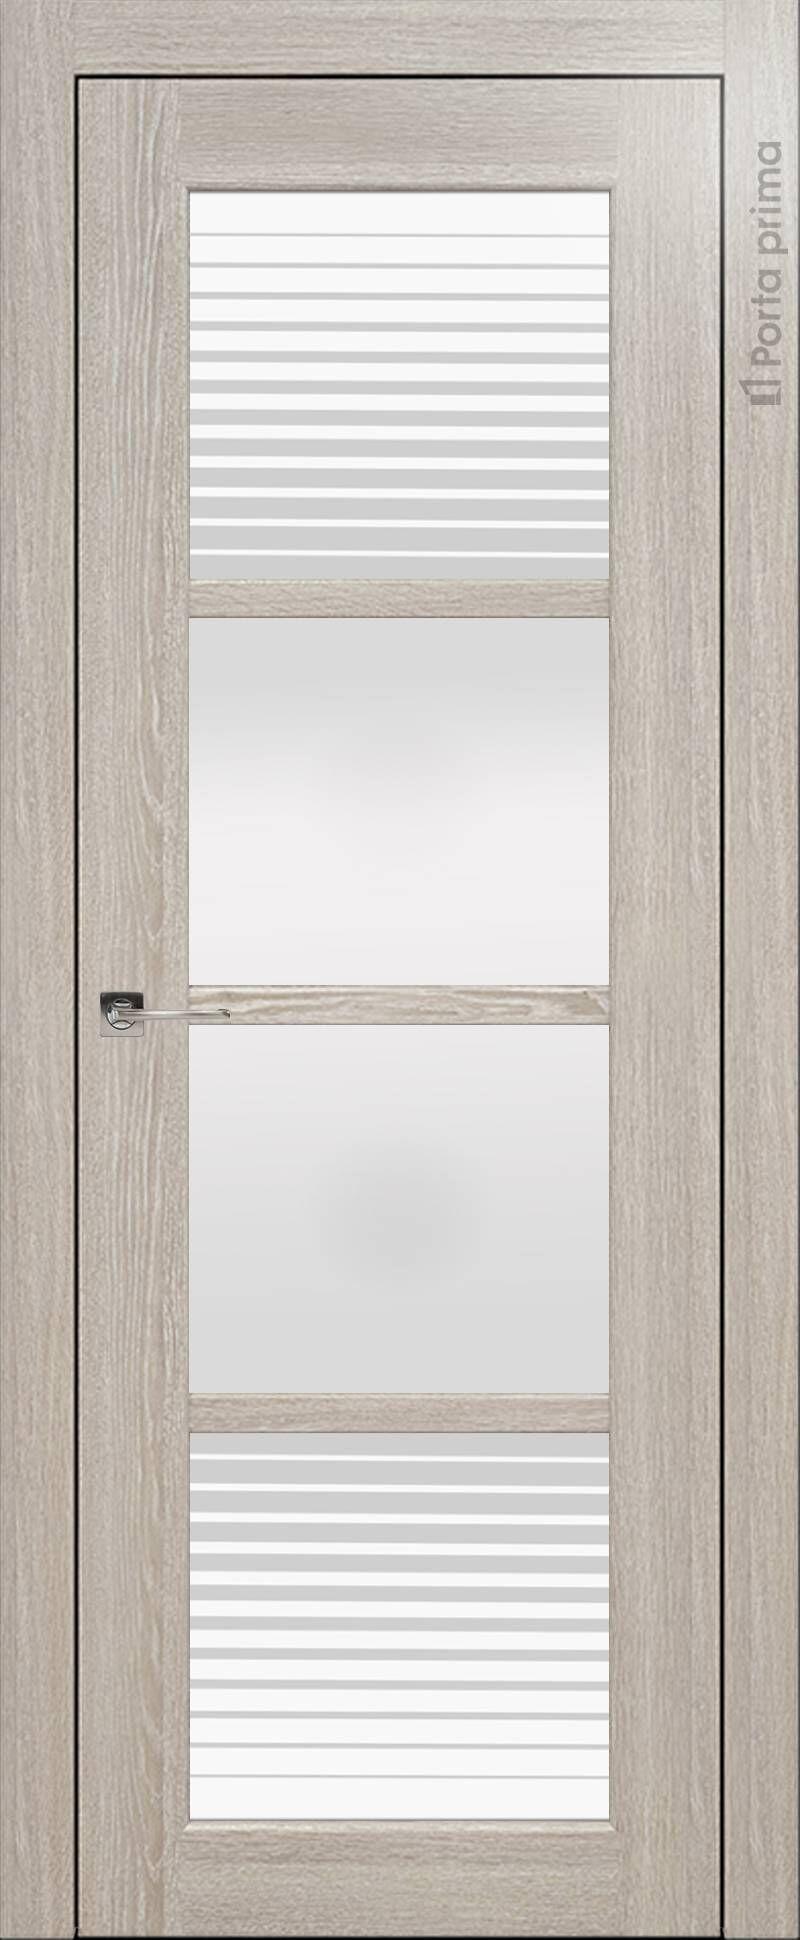 Felicia цвет - Серый дуб Со стеклом (ДО)